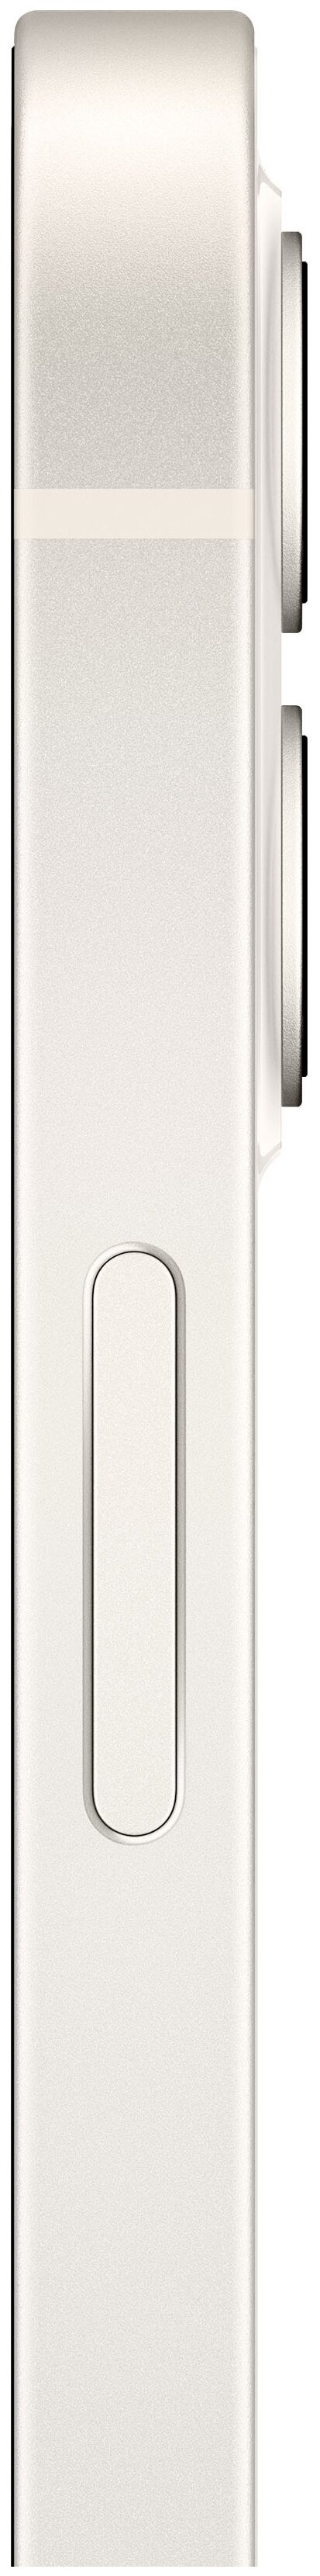 Apple iPhone 12 128GB - интернет: 4G LTE, 5G